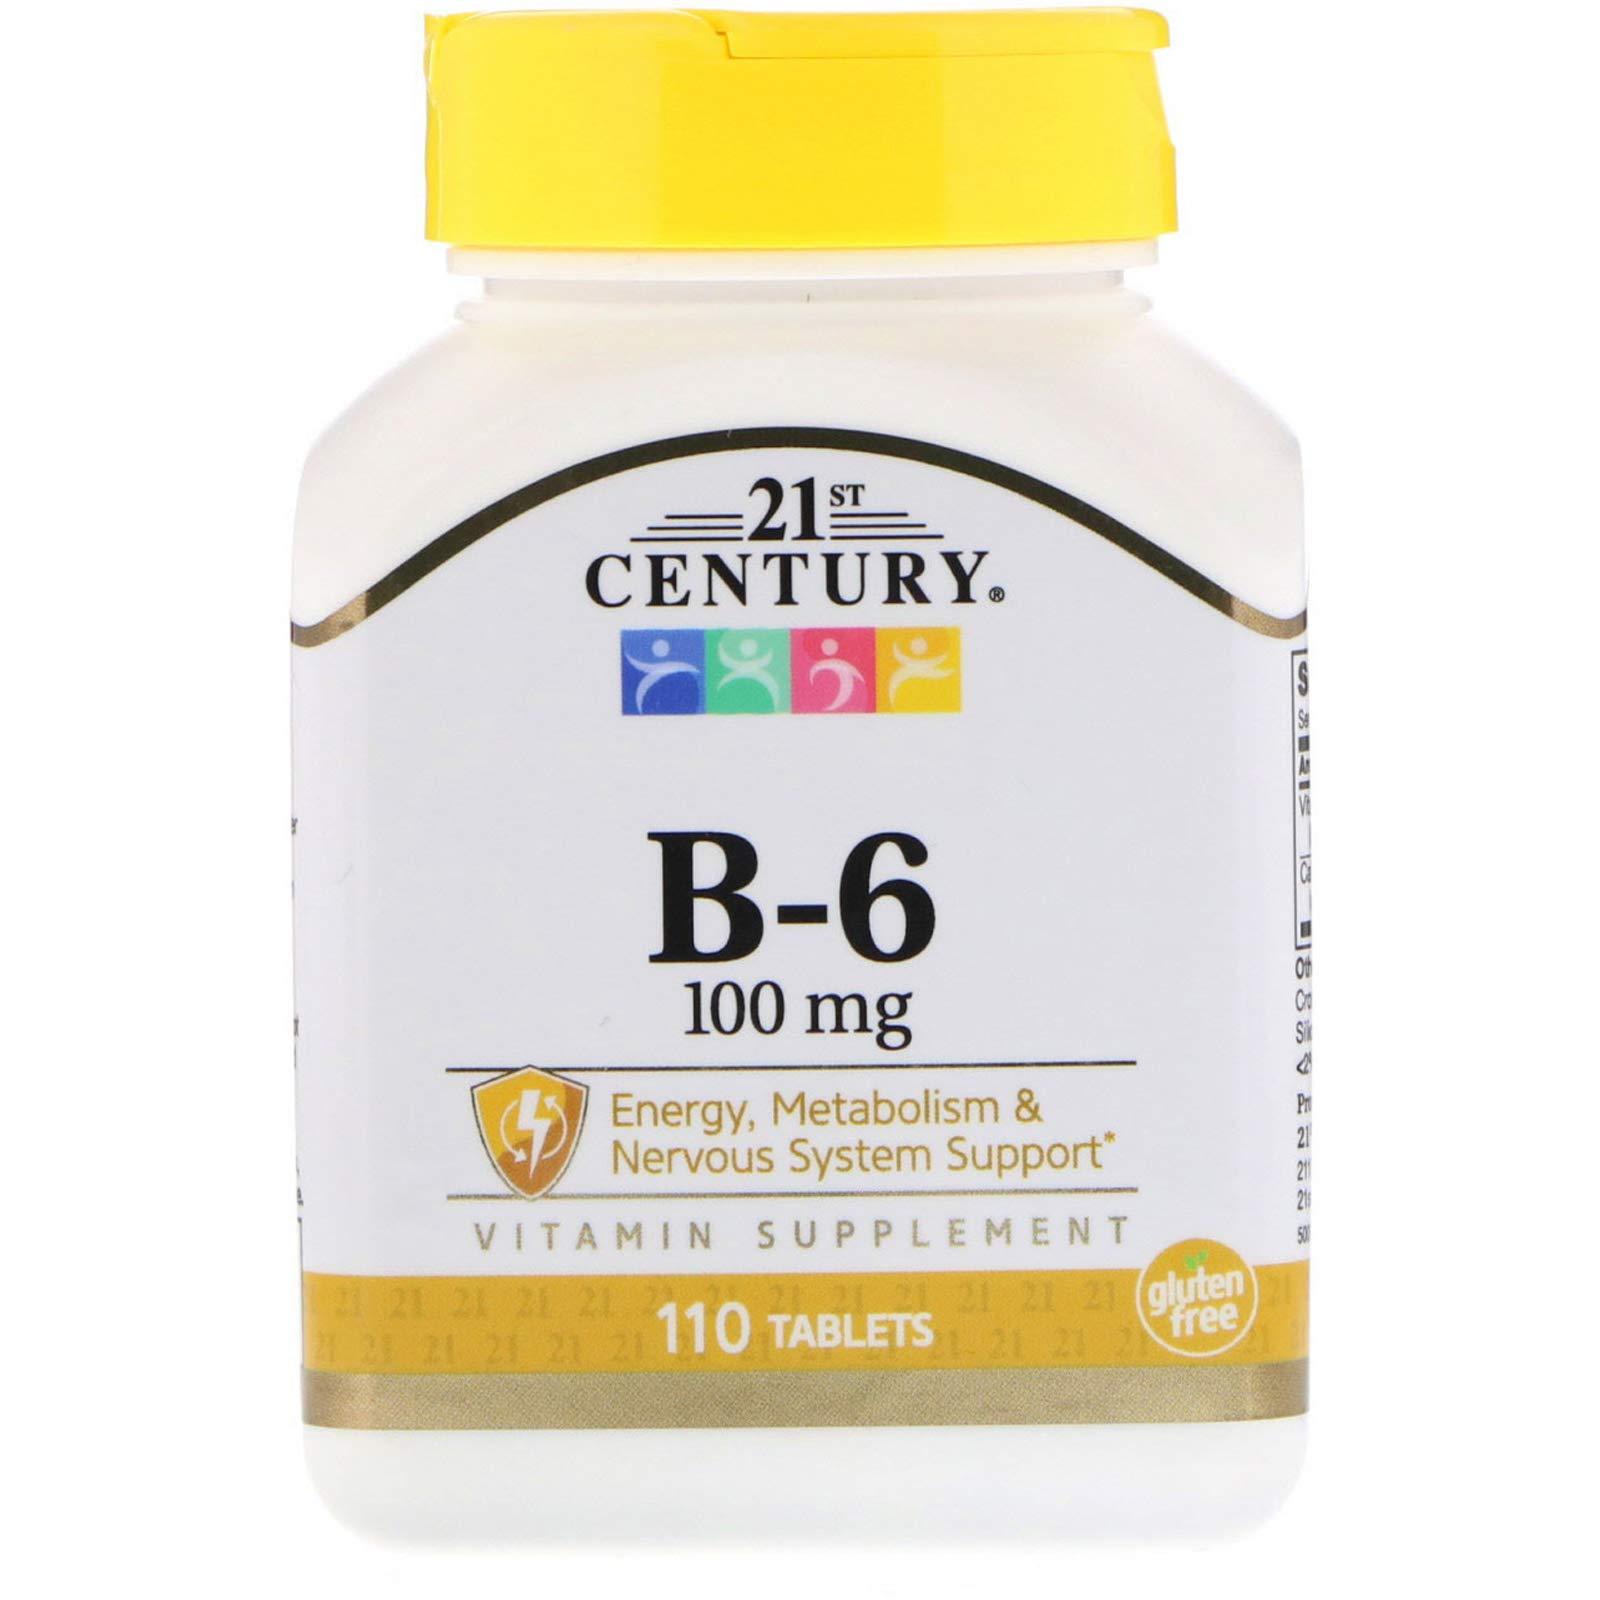 21st Century, B-6, 100 mg, 110 Tablets